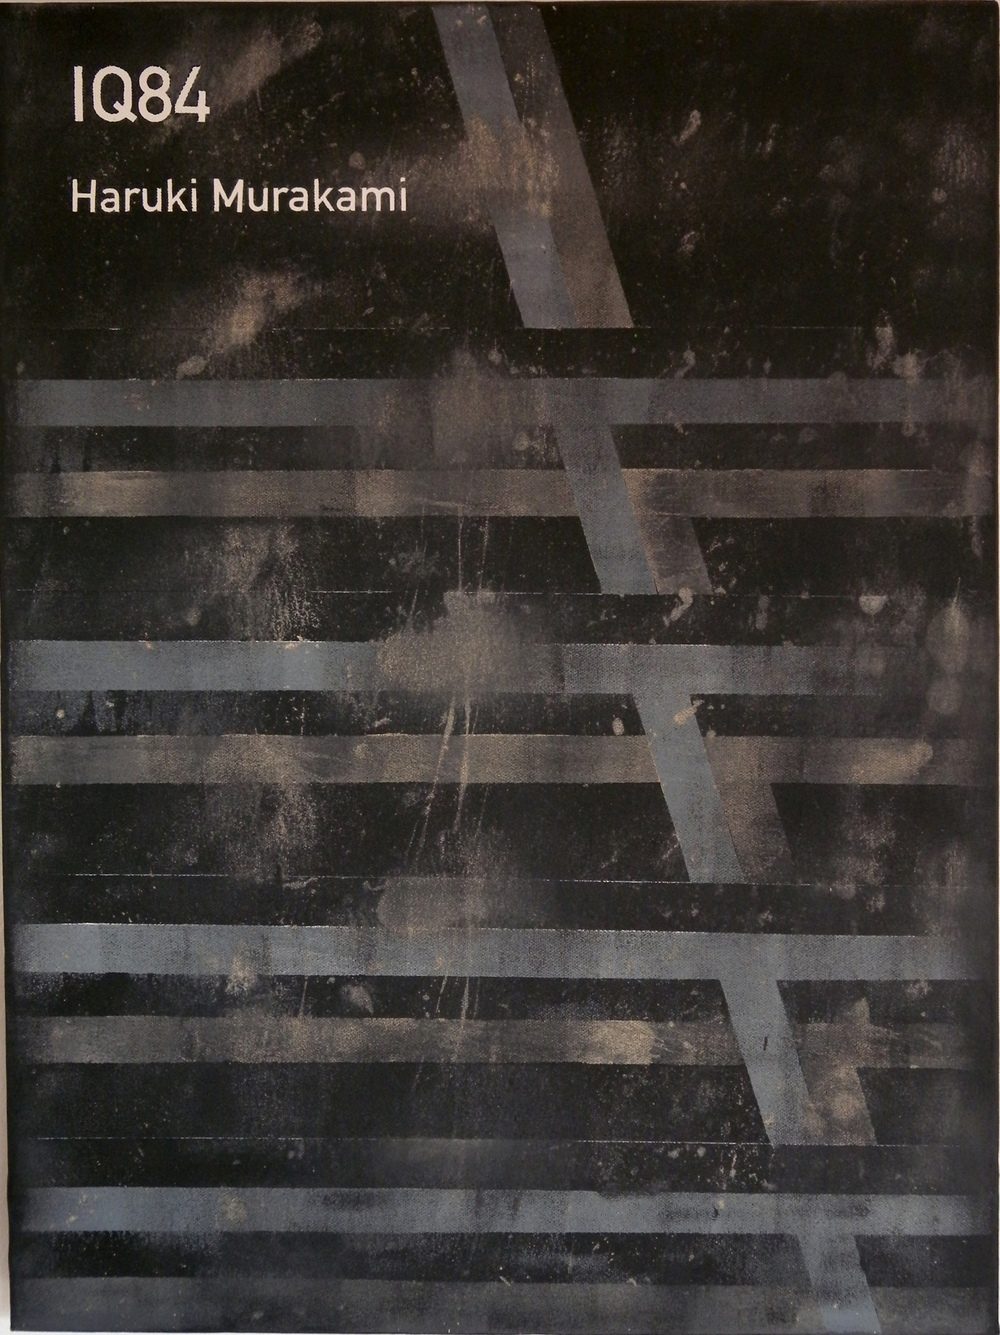 IQ84 / Haruki Murakami  2012 Acrylic on canvas 46 x 61 x 3.5 cm